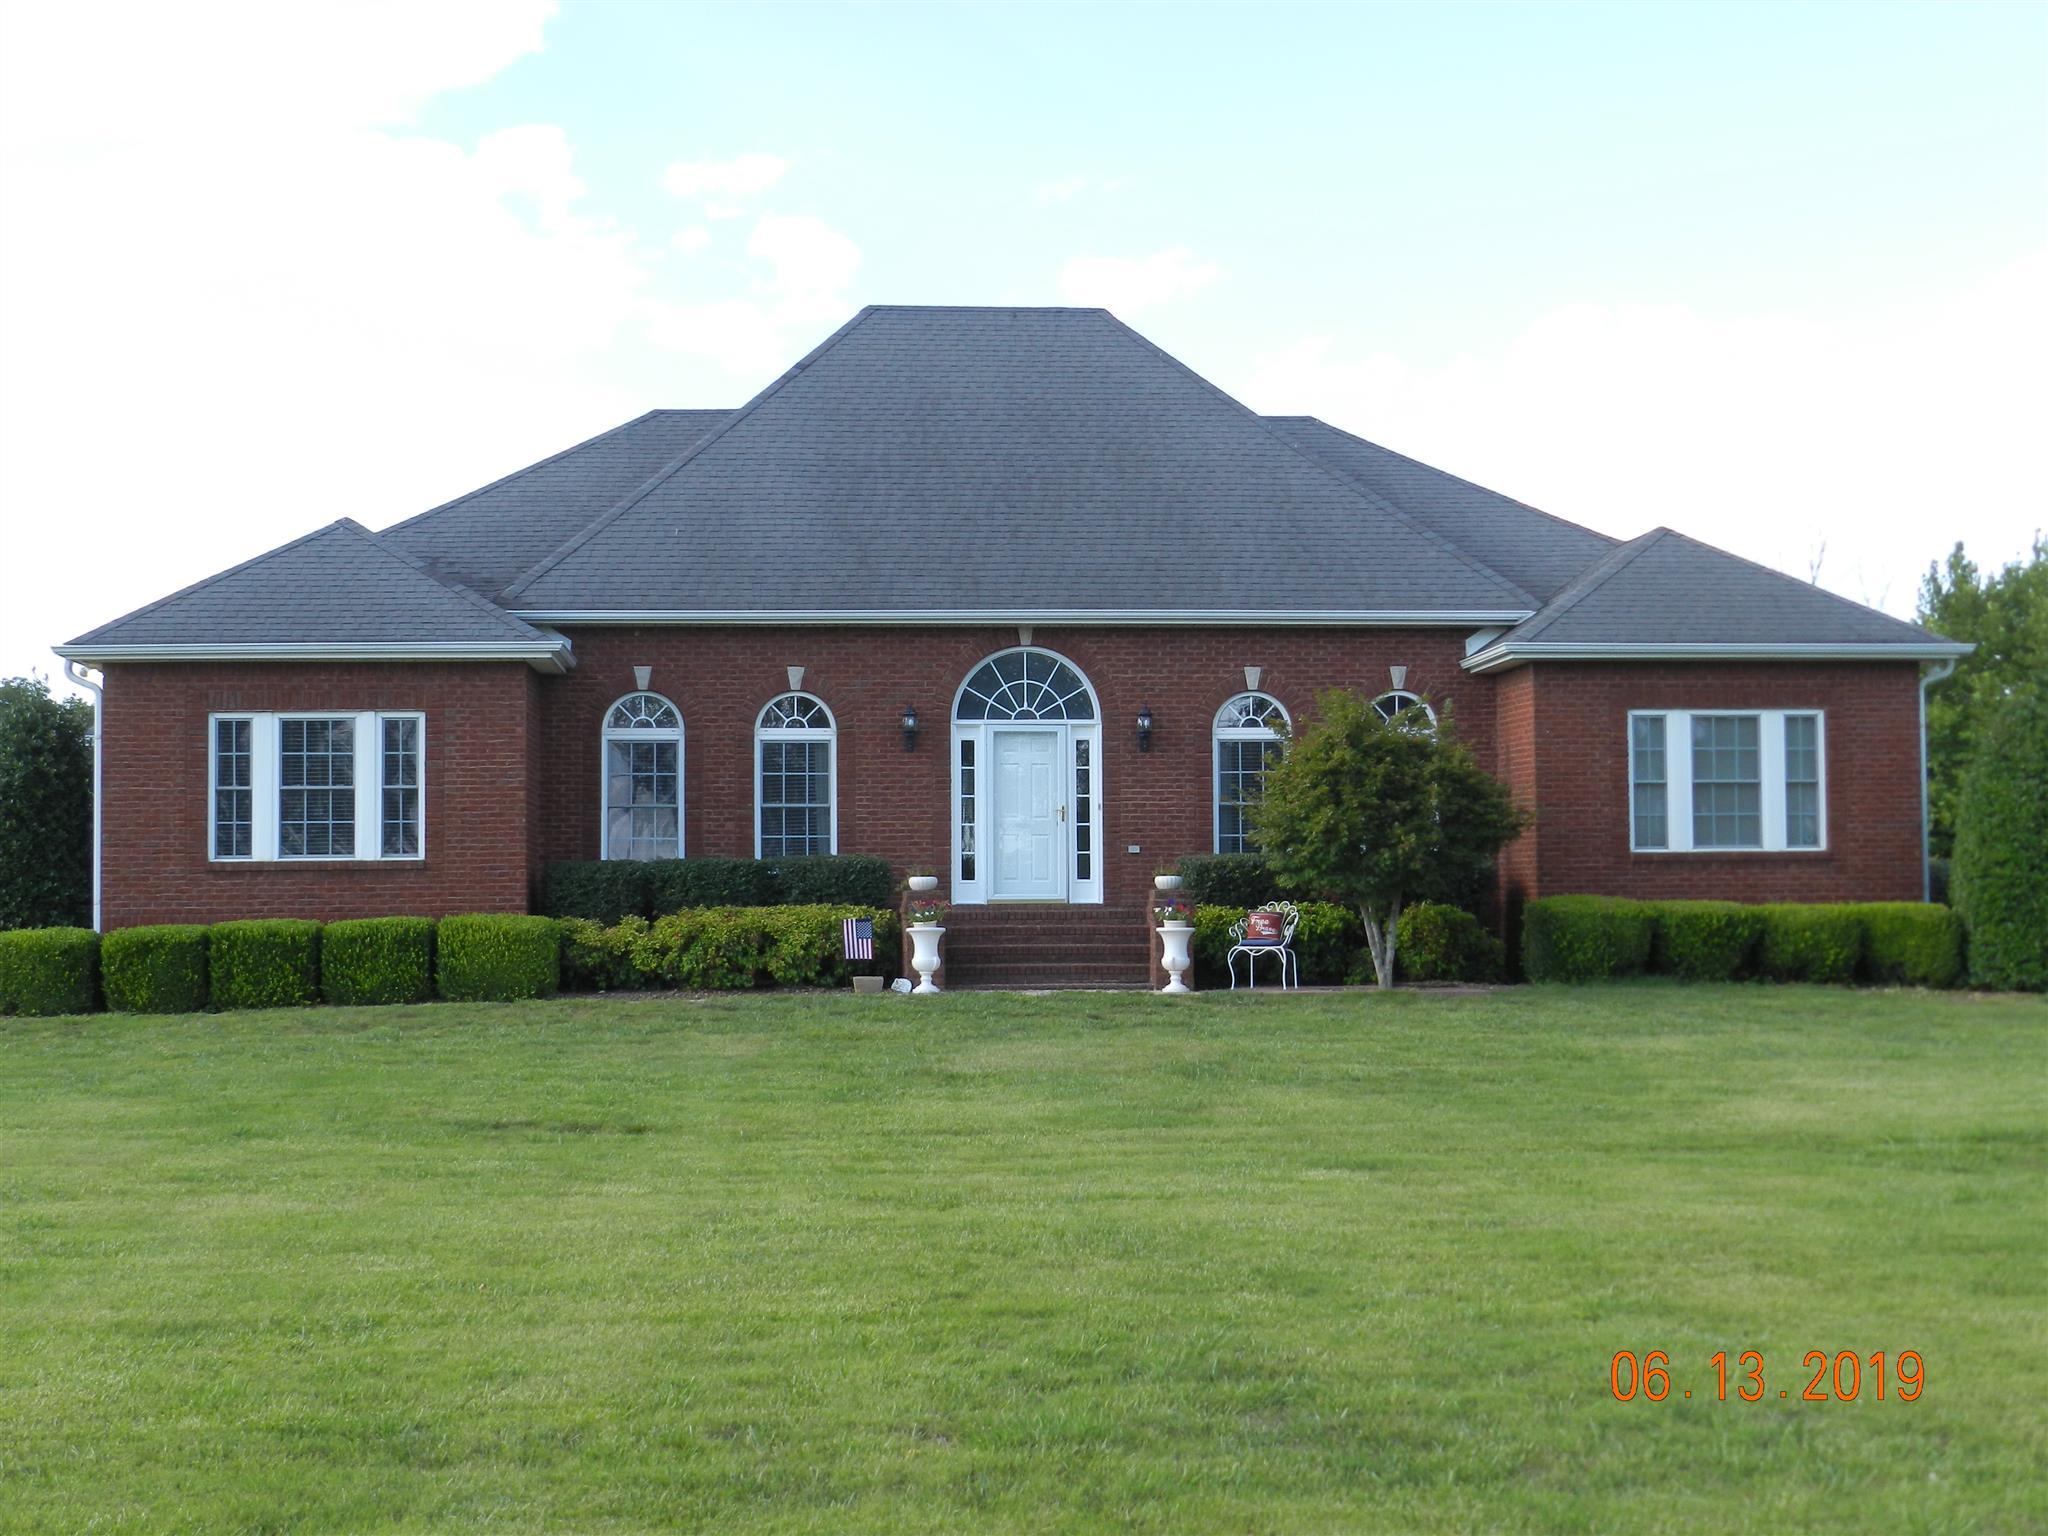 4907 Sango Rd, Clarksville, TN 37043 - Clarksville, TN real estate listing